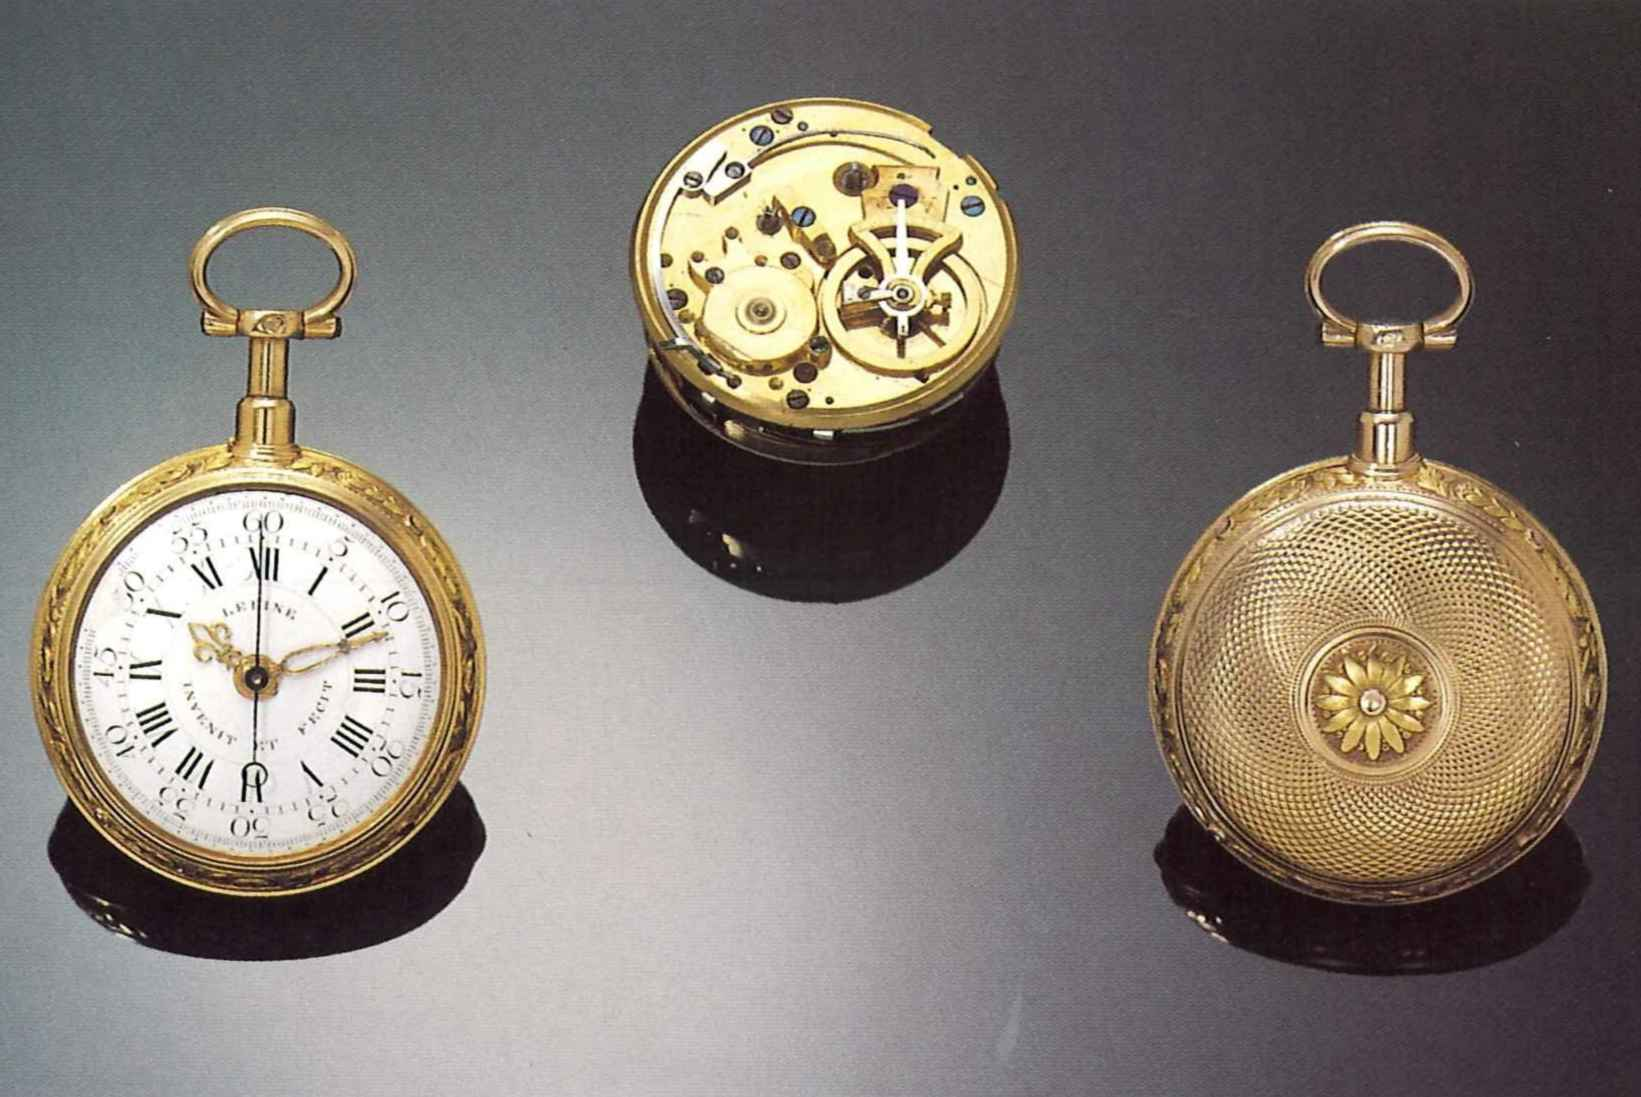 lepine horloger du roy a paris invenit et fecit no 3053 paris hallmarks for 1778 very rare and fine 18 ct two coloured gold early quarter